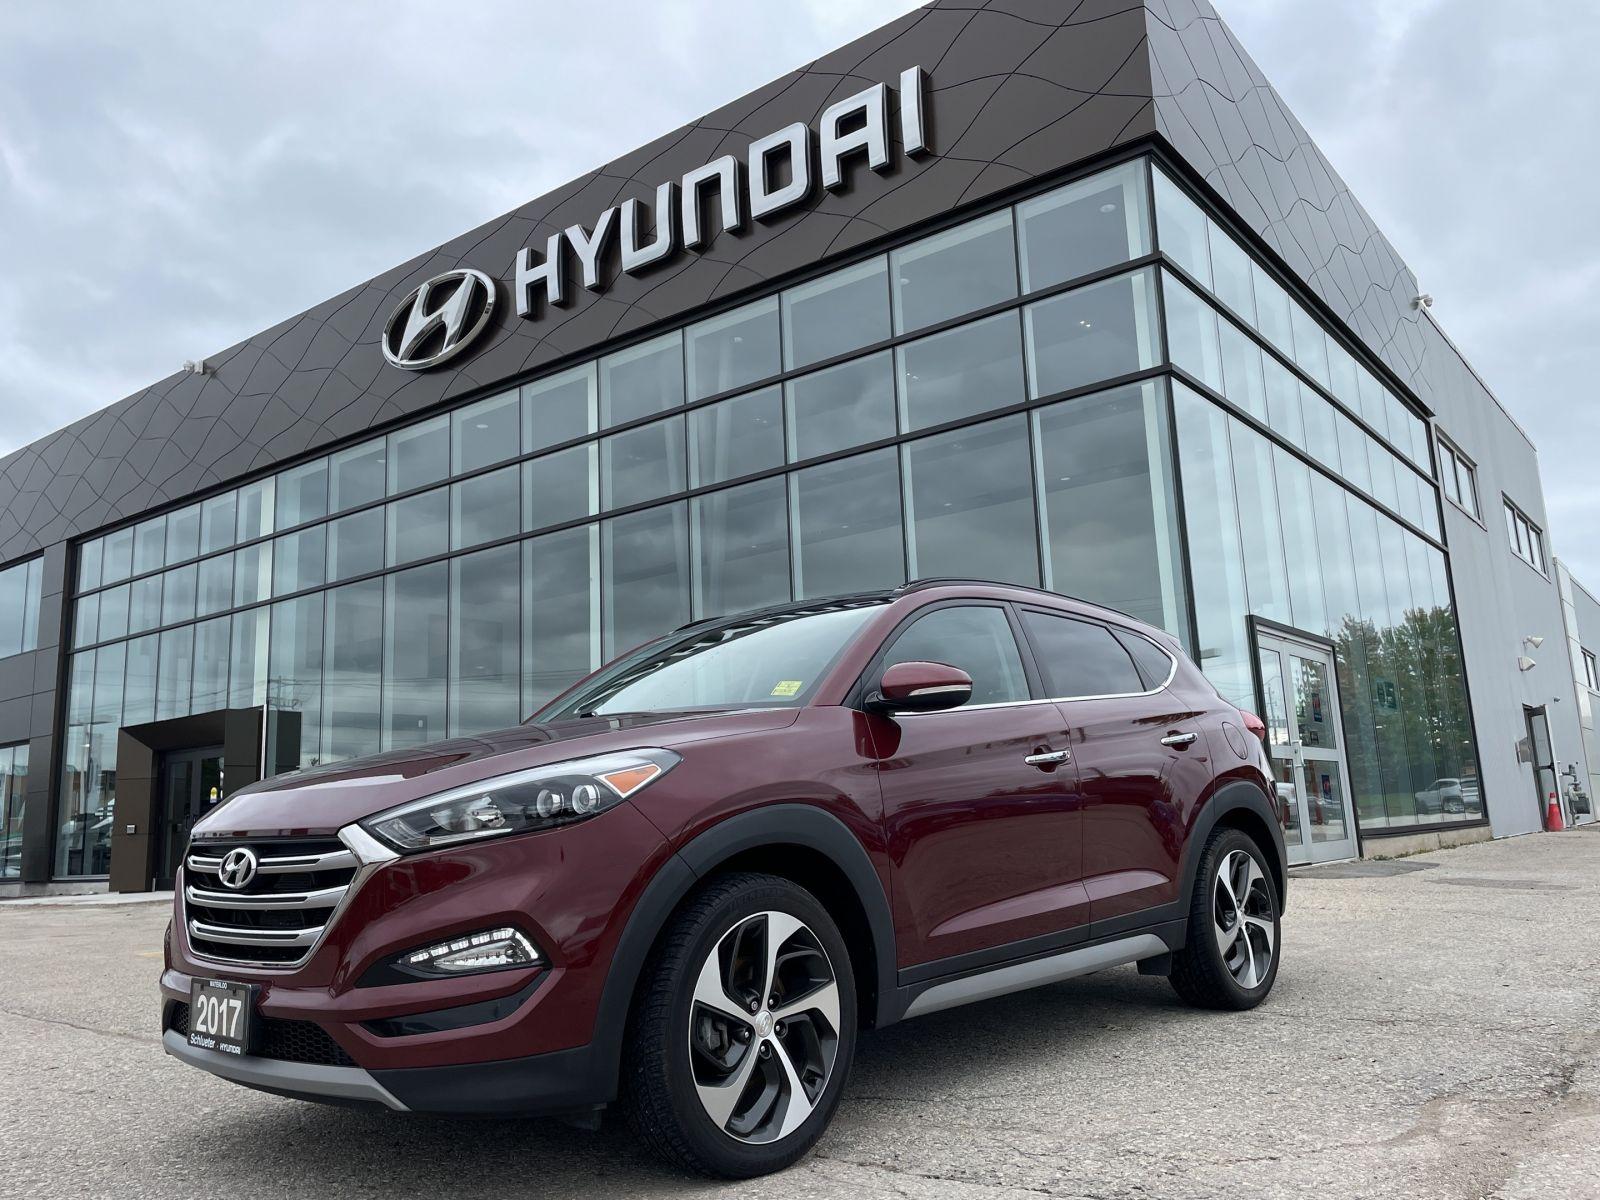 2017 Hyundai Tucson Image